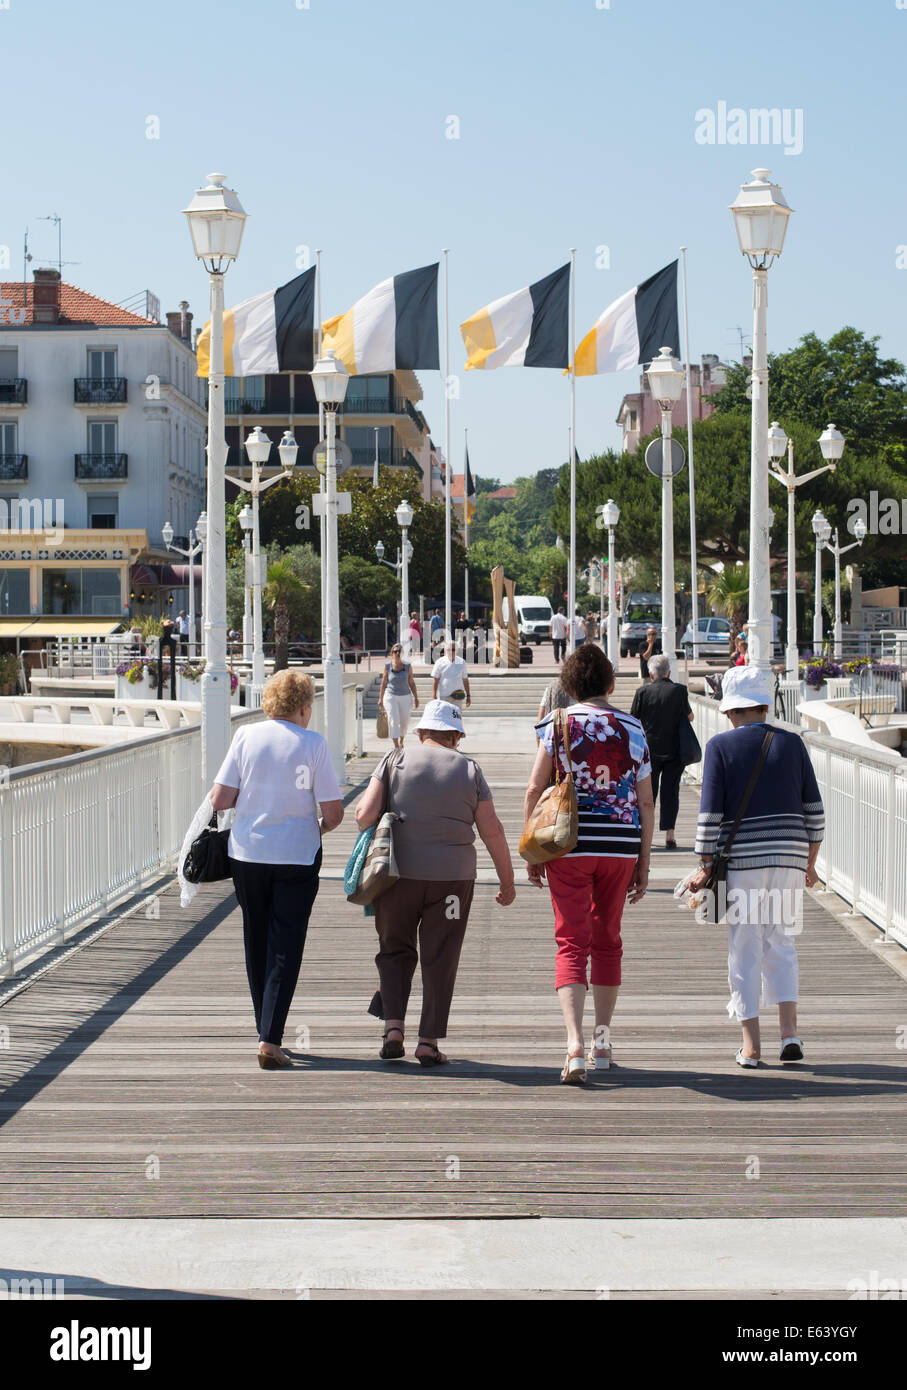 group-of-four-older-women-walking-along-